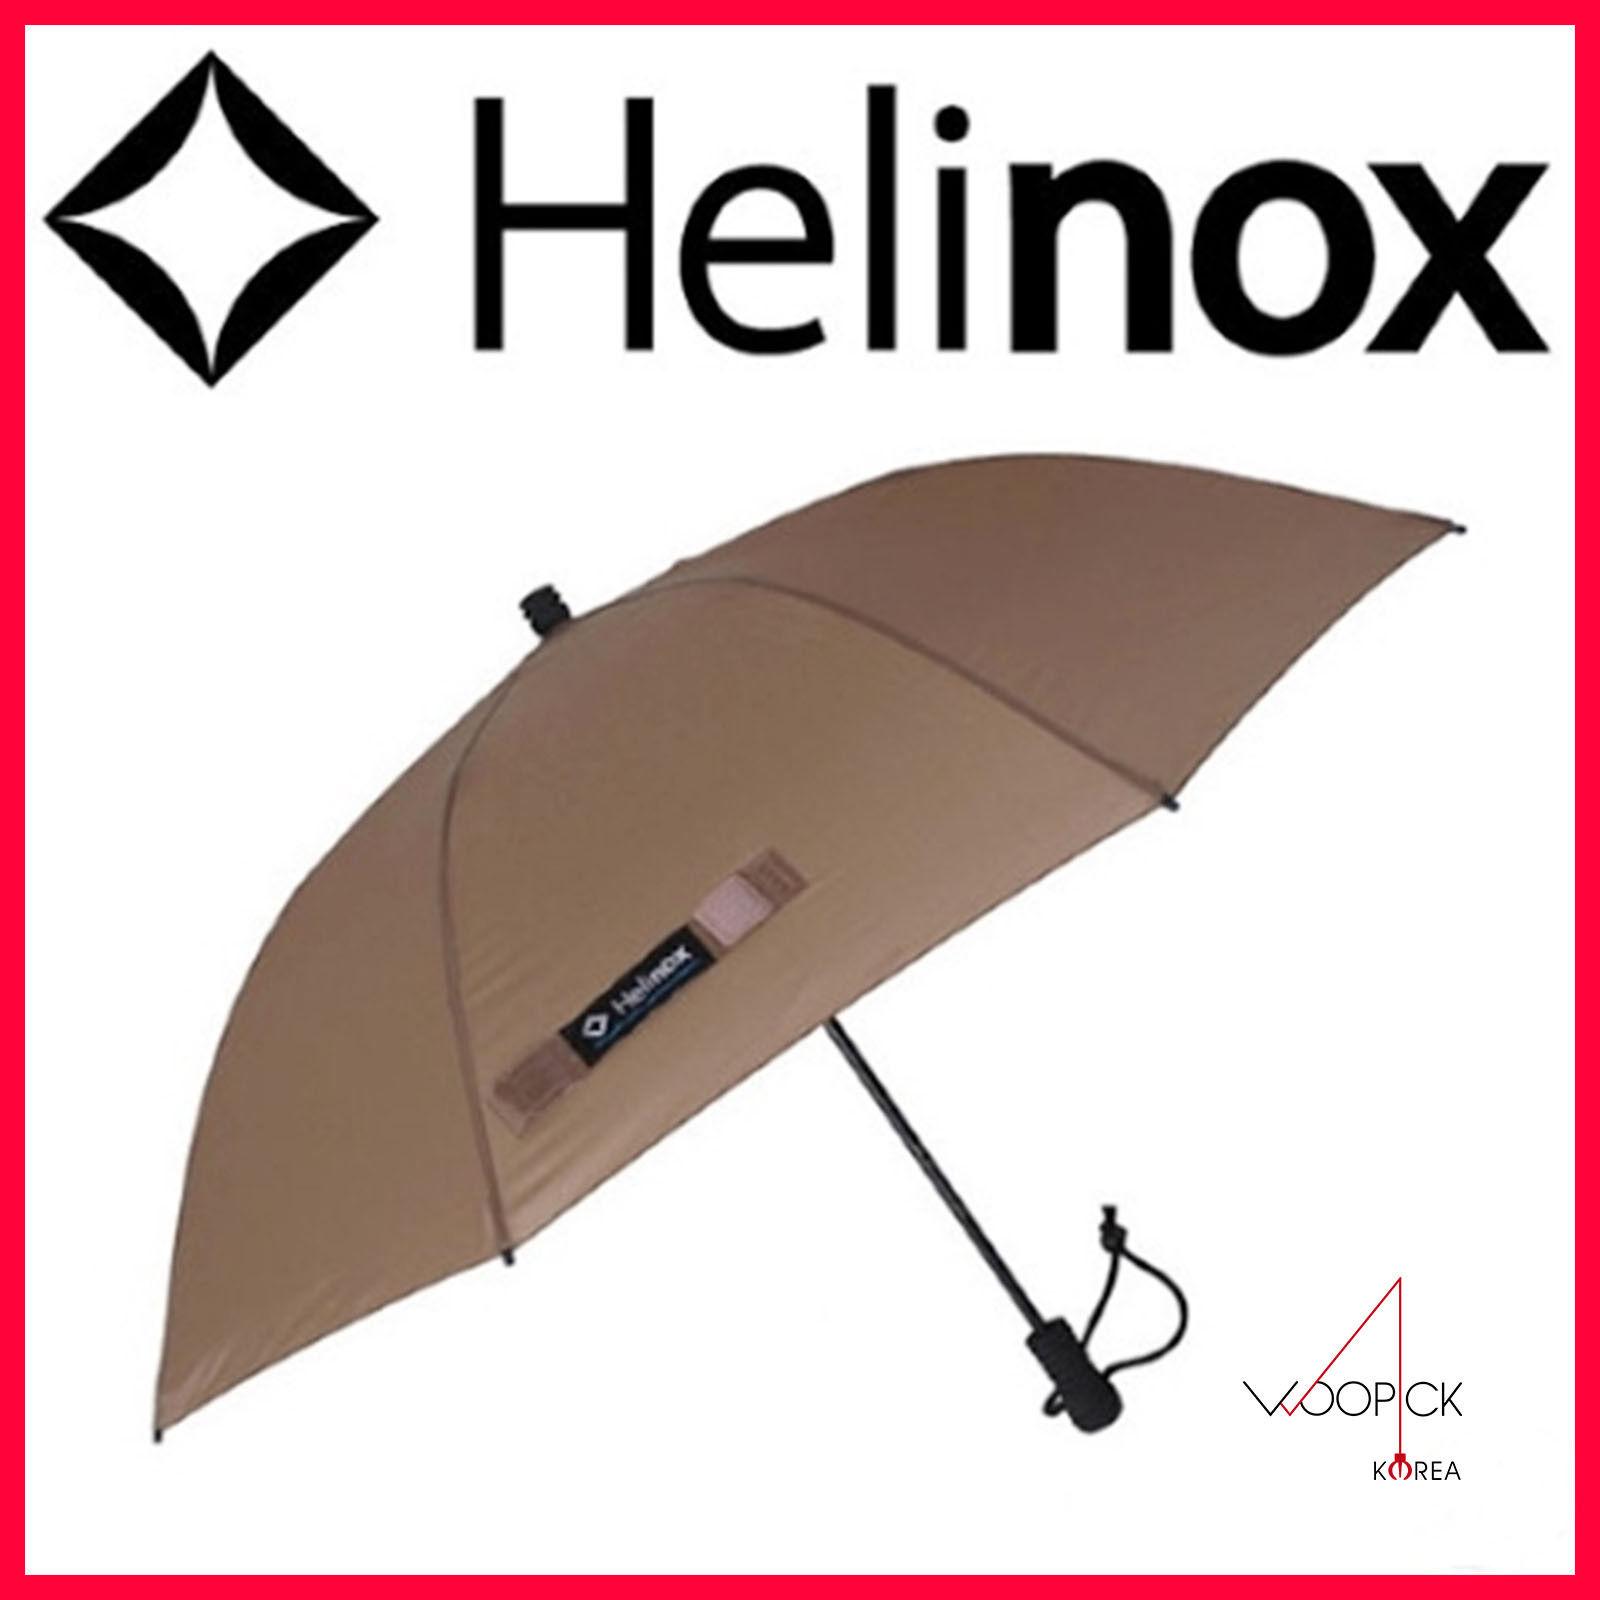 Helinox X Eberhard Gobel Parapluie Tan Léger Camping Outdoor Picnic -210 G